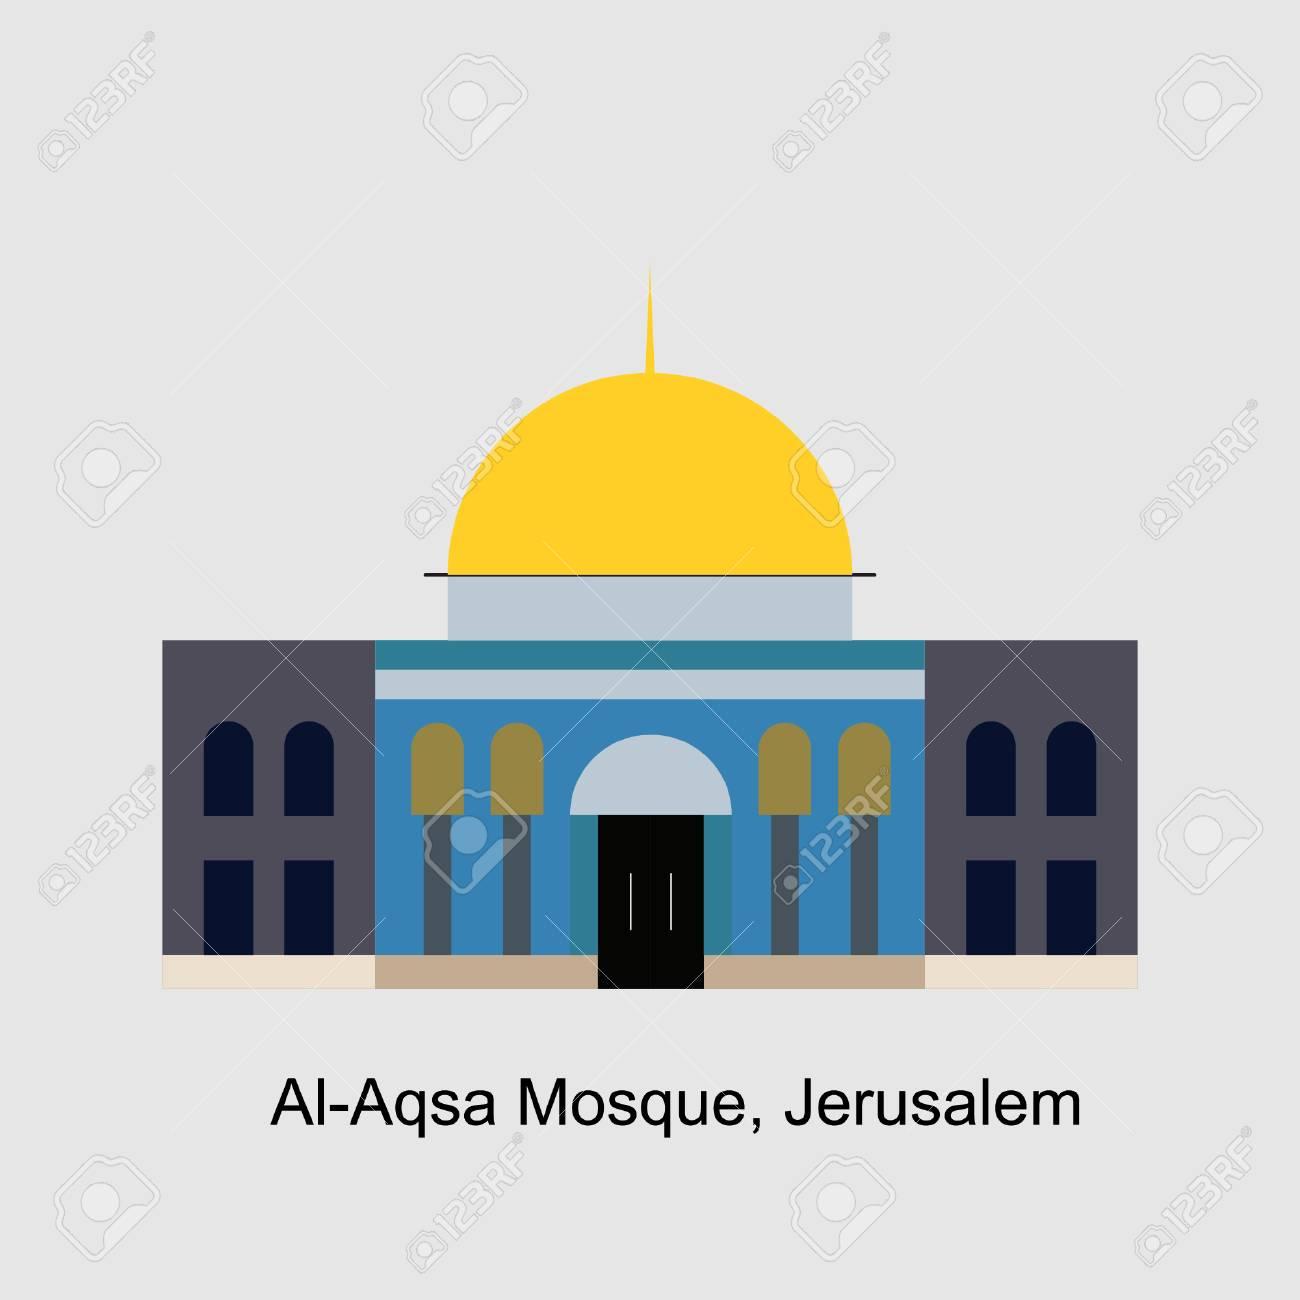 Al Aqsa Mosque Vector Illustration Royalty Free Cliparts Vectors And Stock Illustration Image 91524558